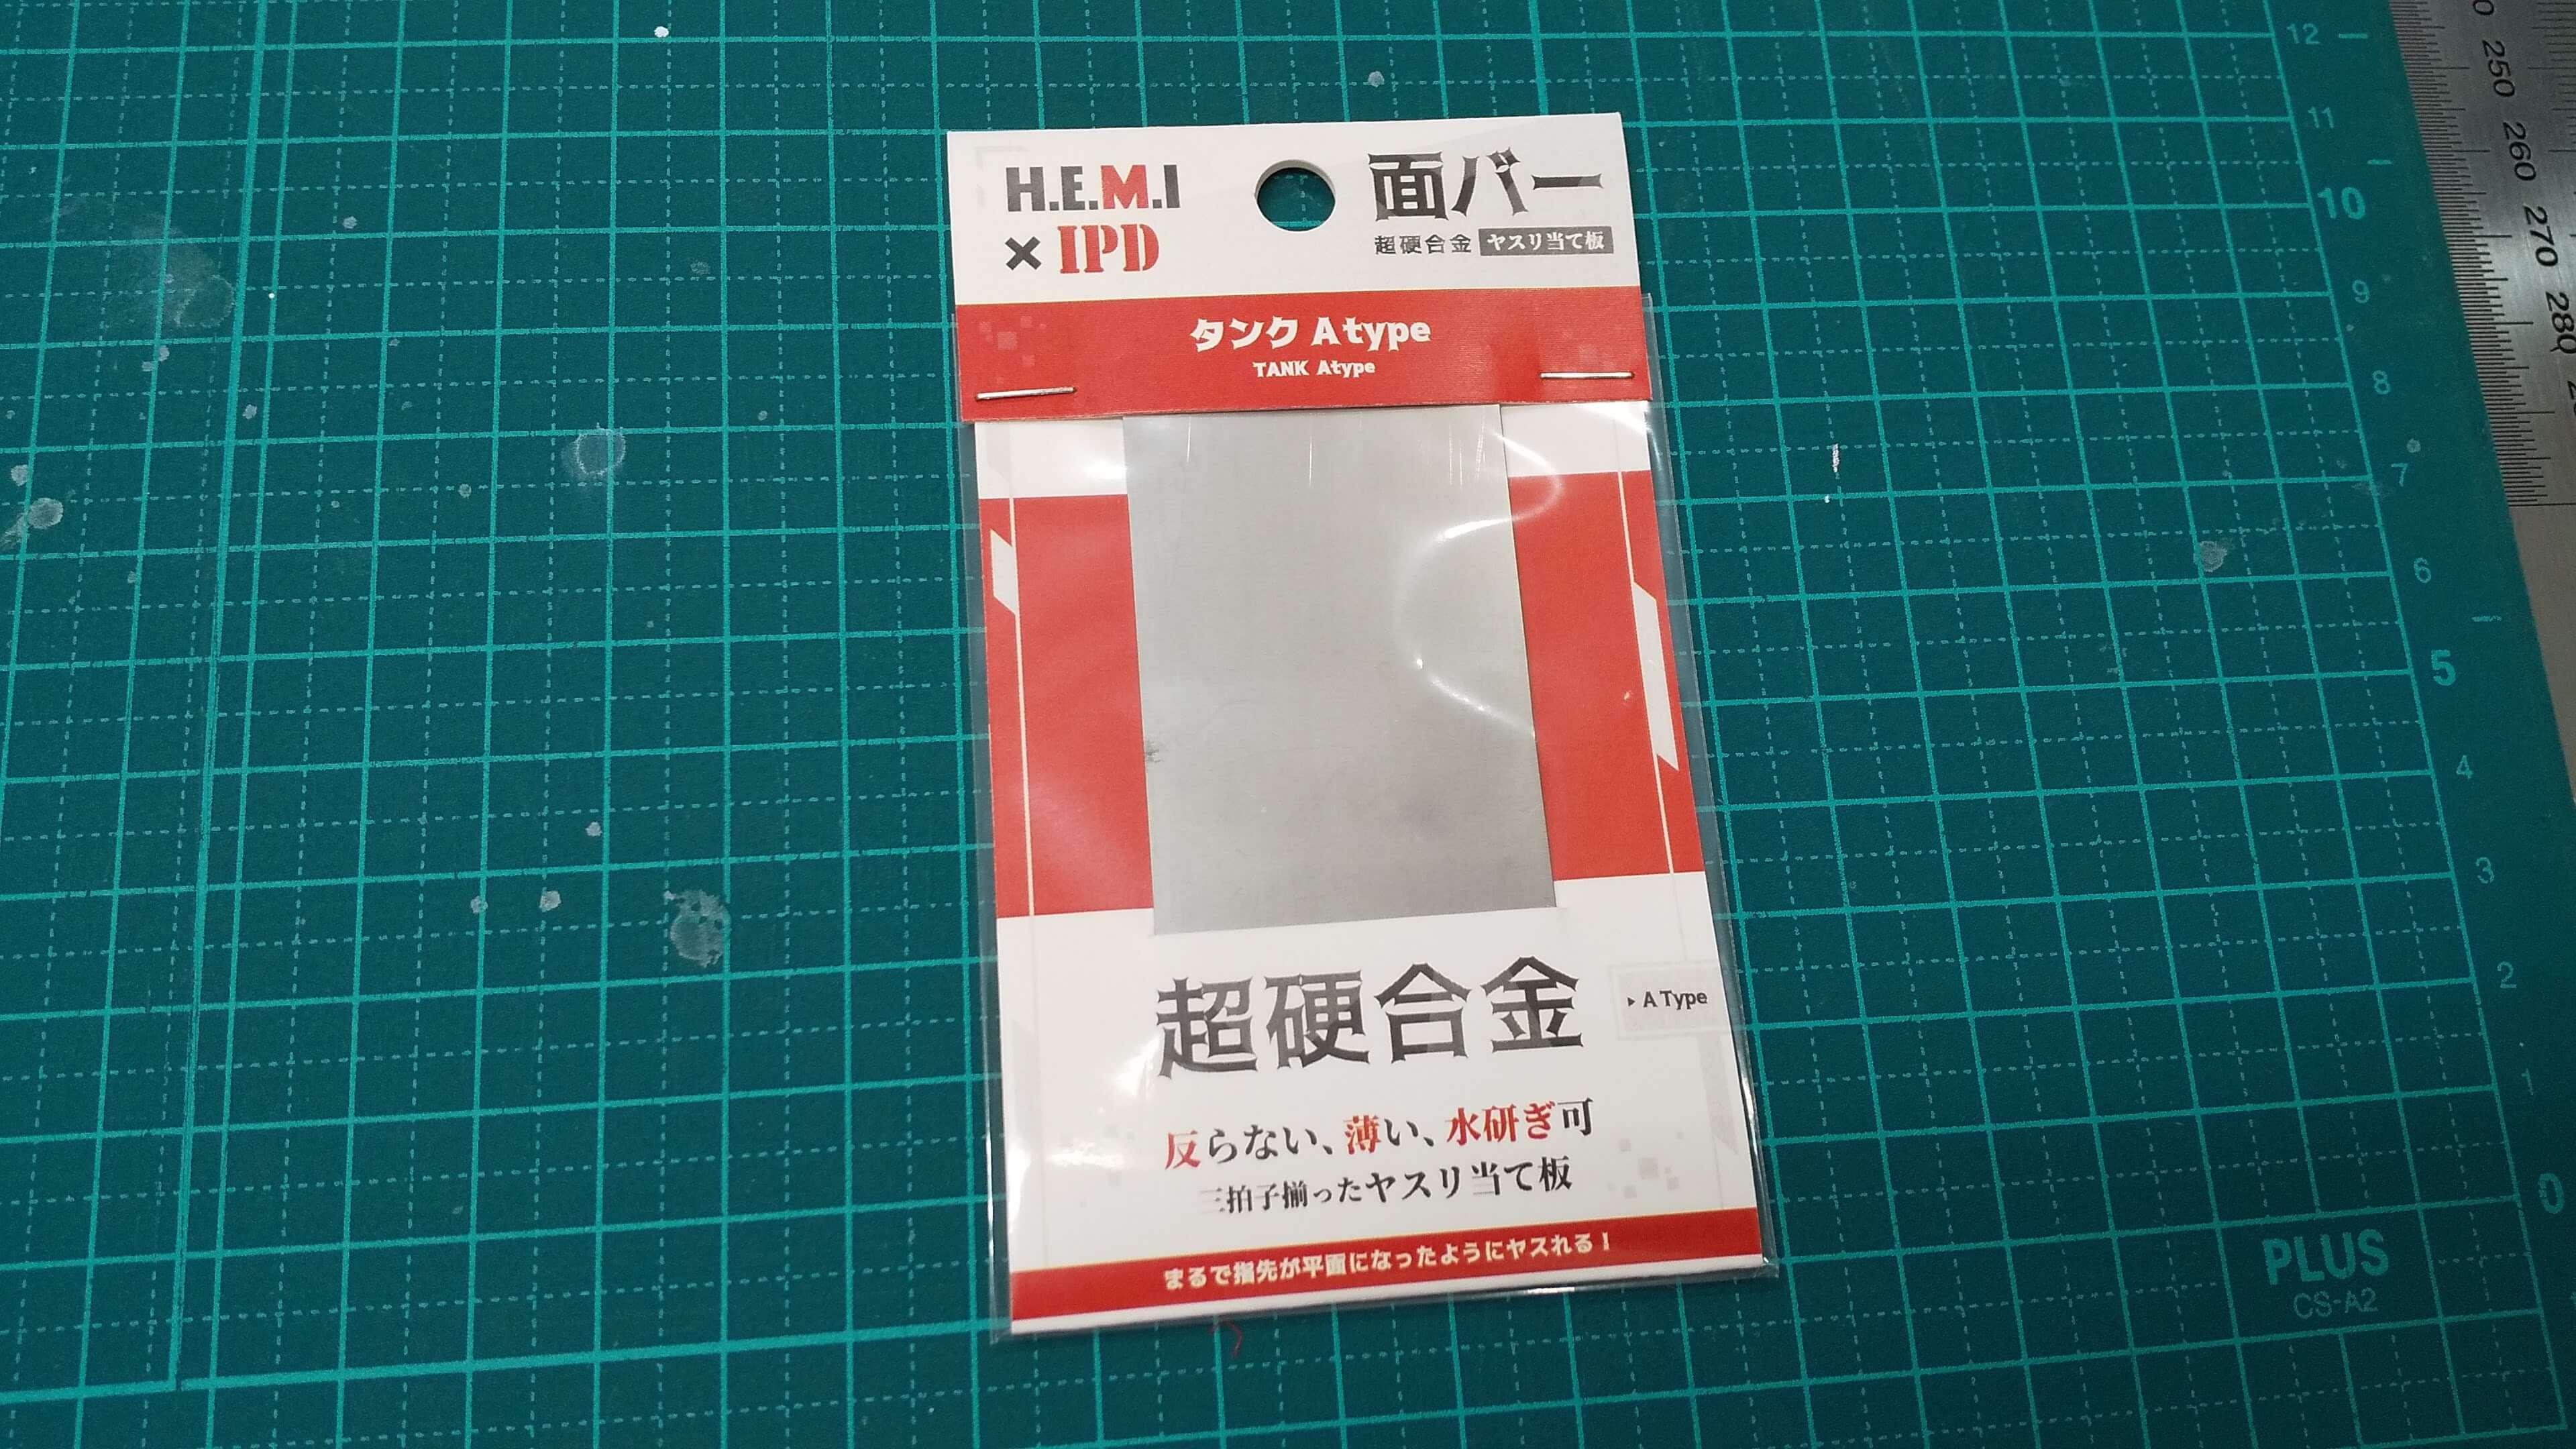 HEMIxIPD 面バー タンク A Type 4570099260099